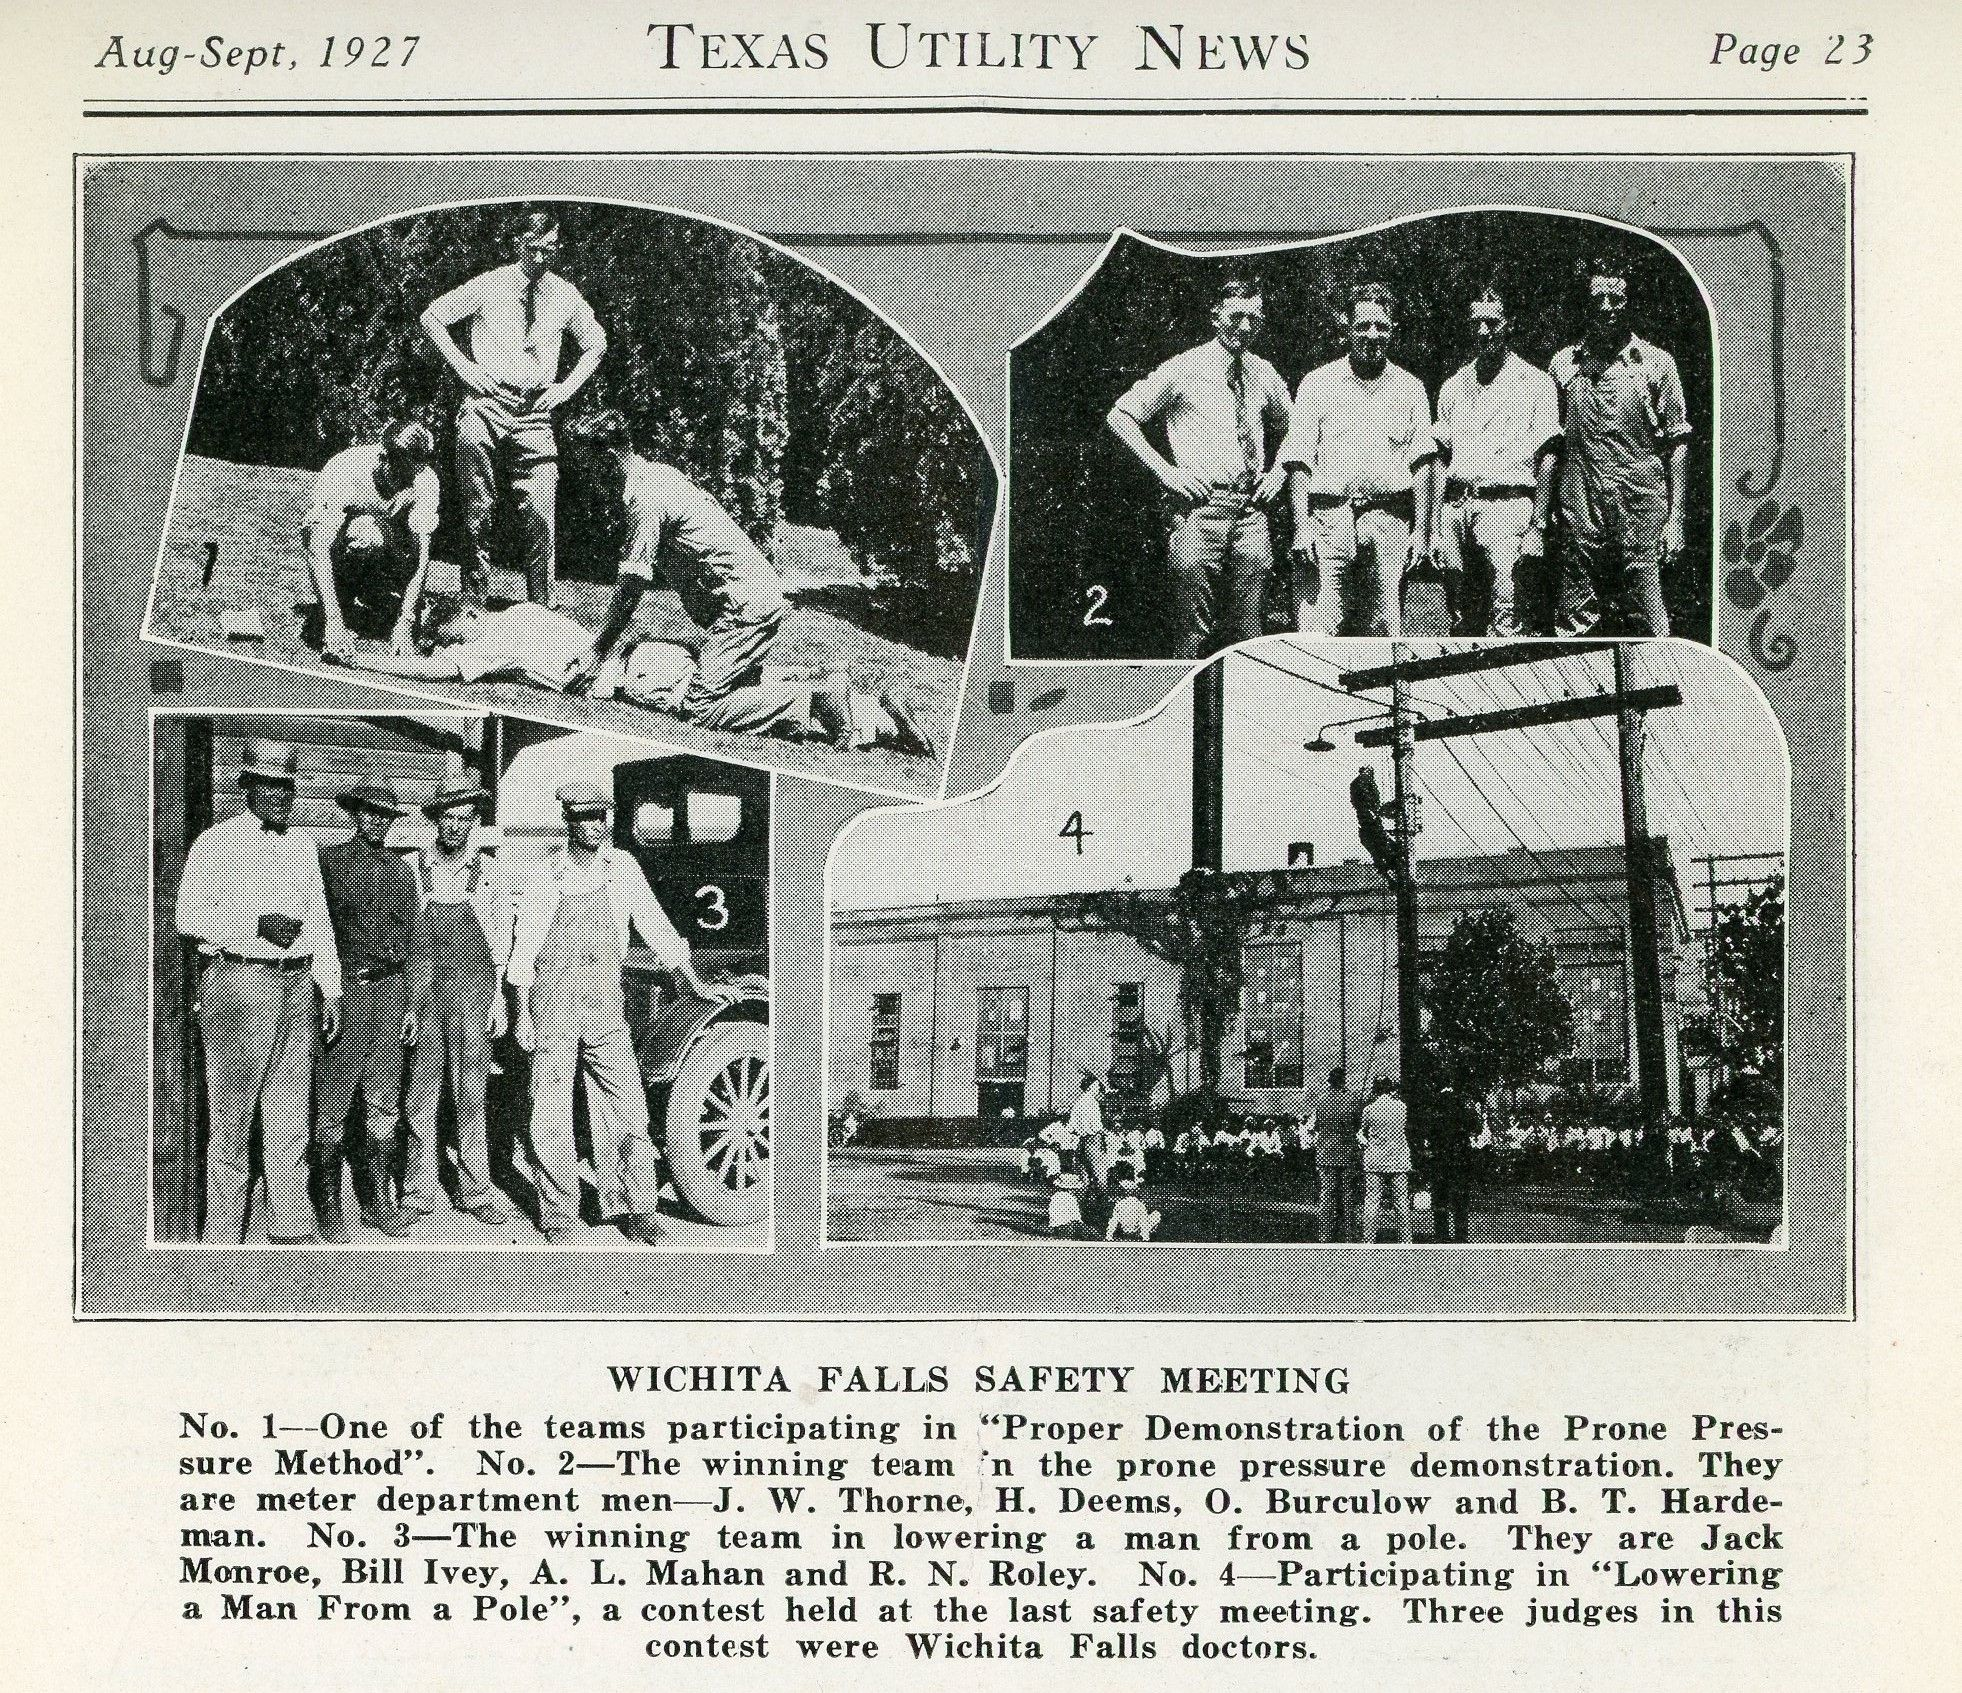 August September 1927 Texas Utility News Wichita Falls Texas